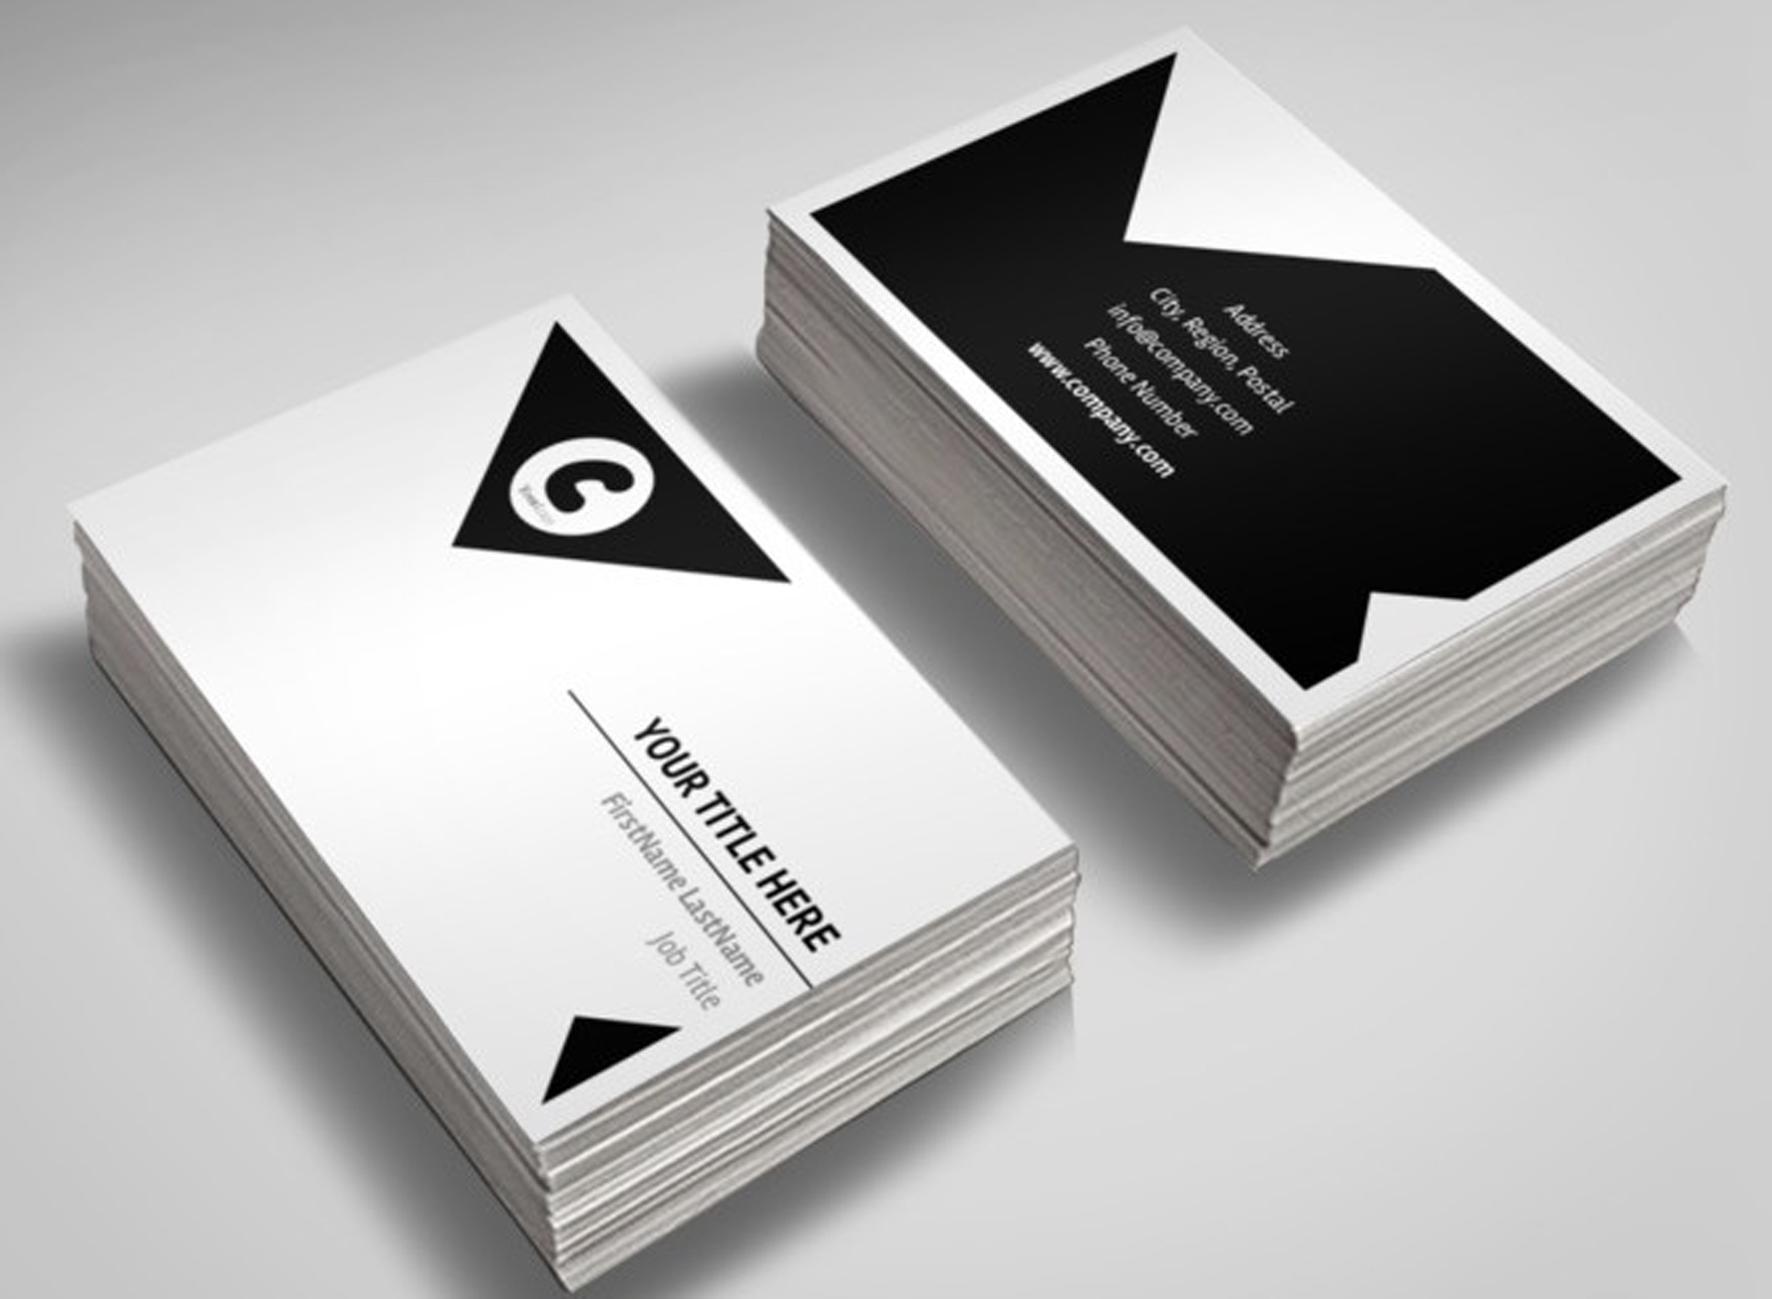 Van Print Digital Printing